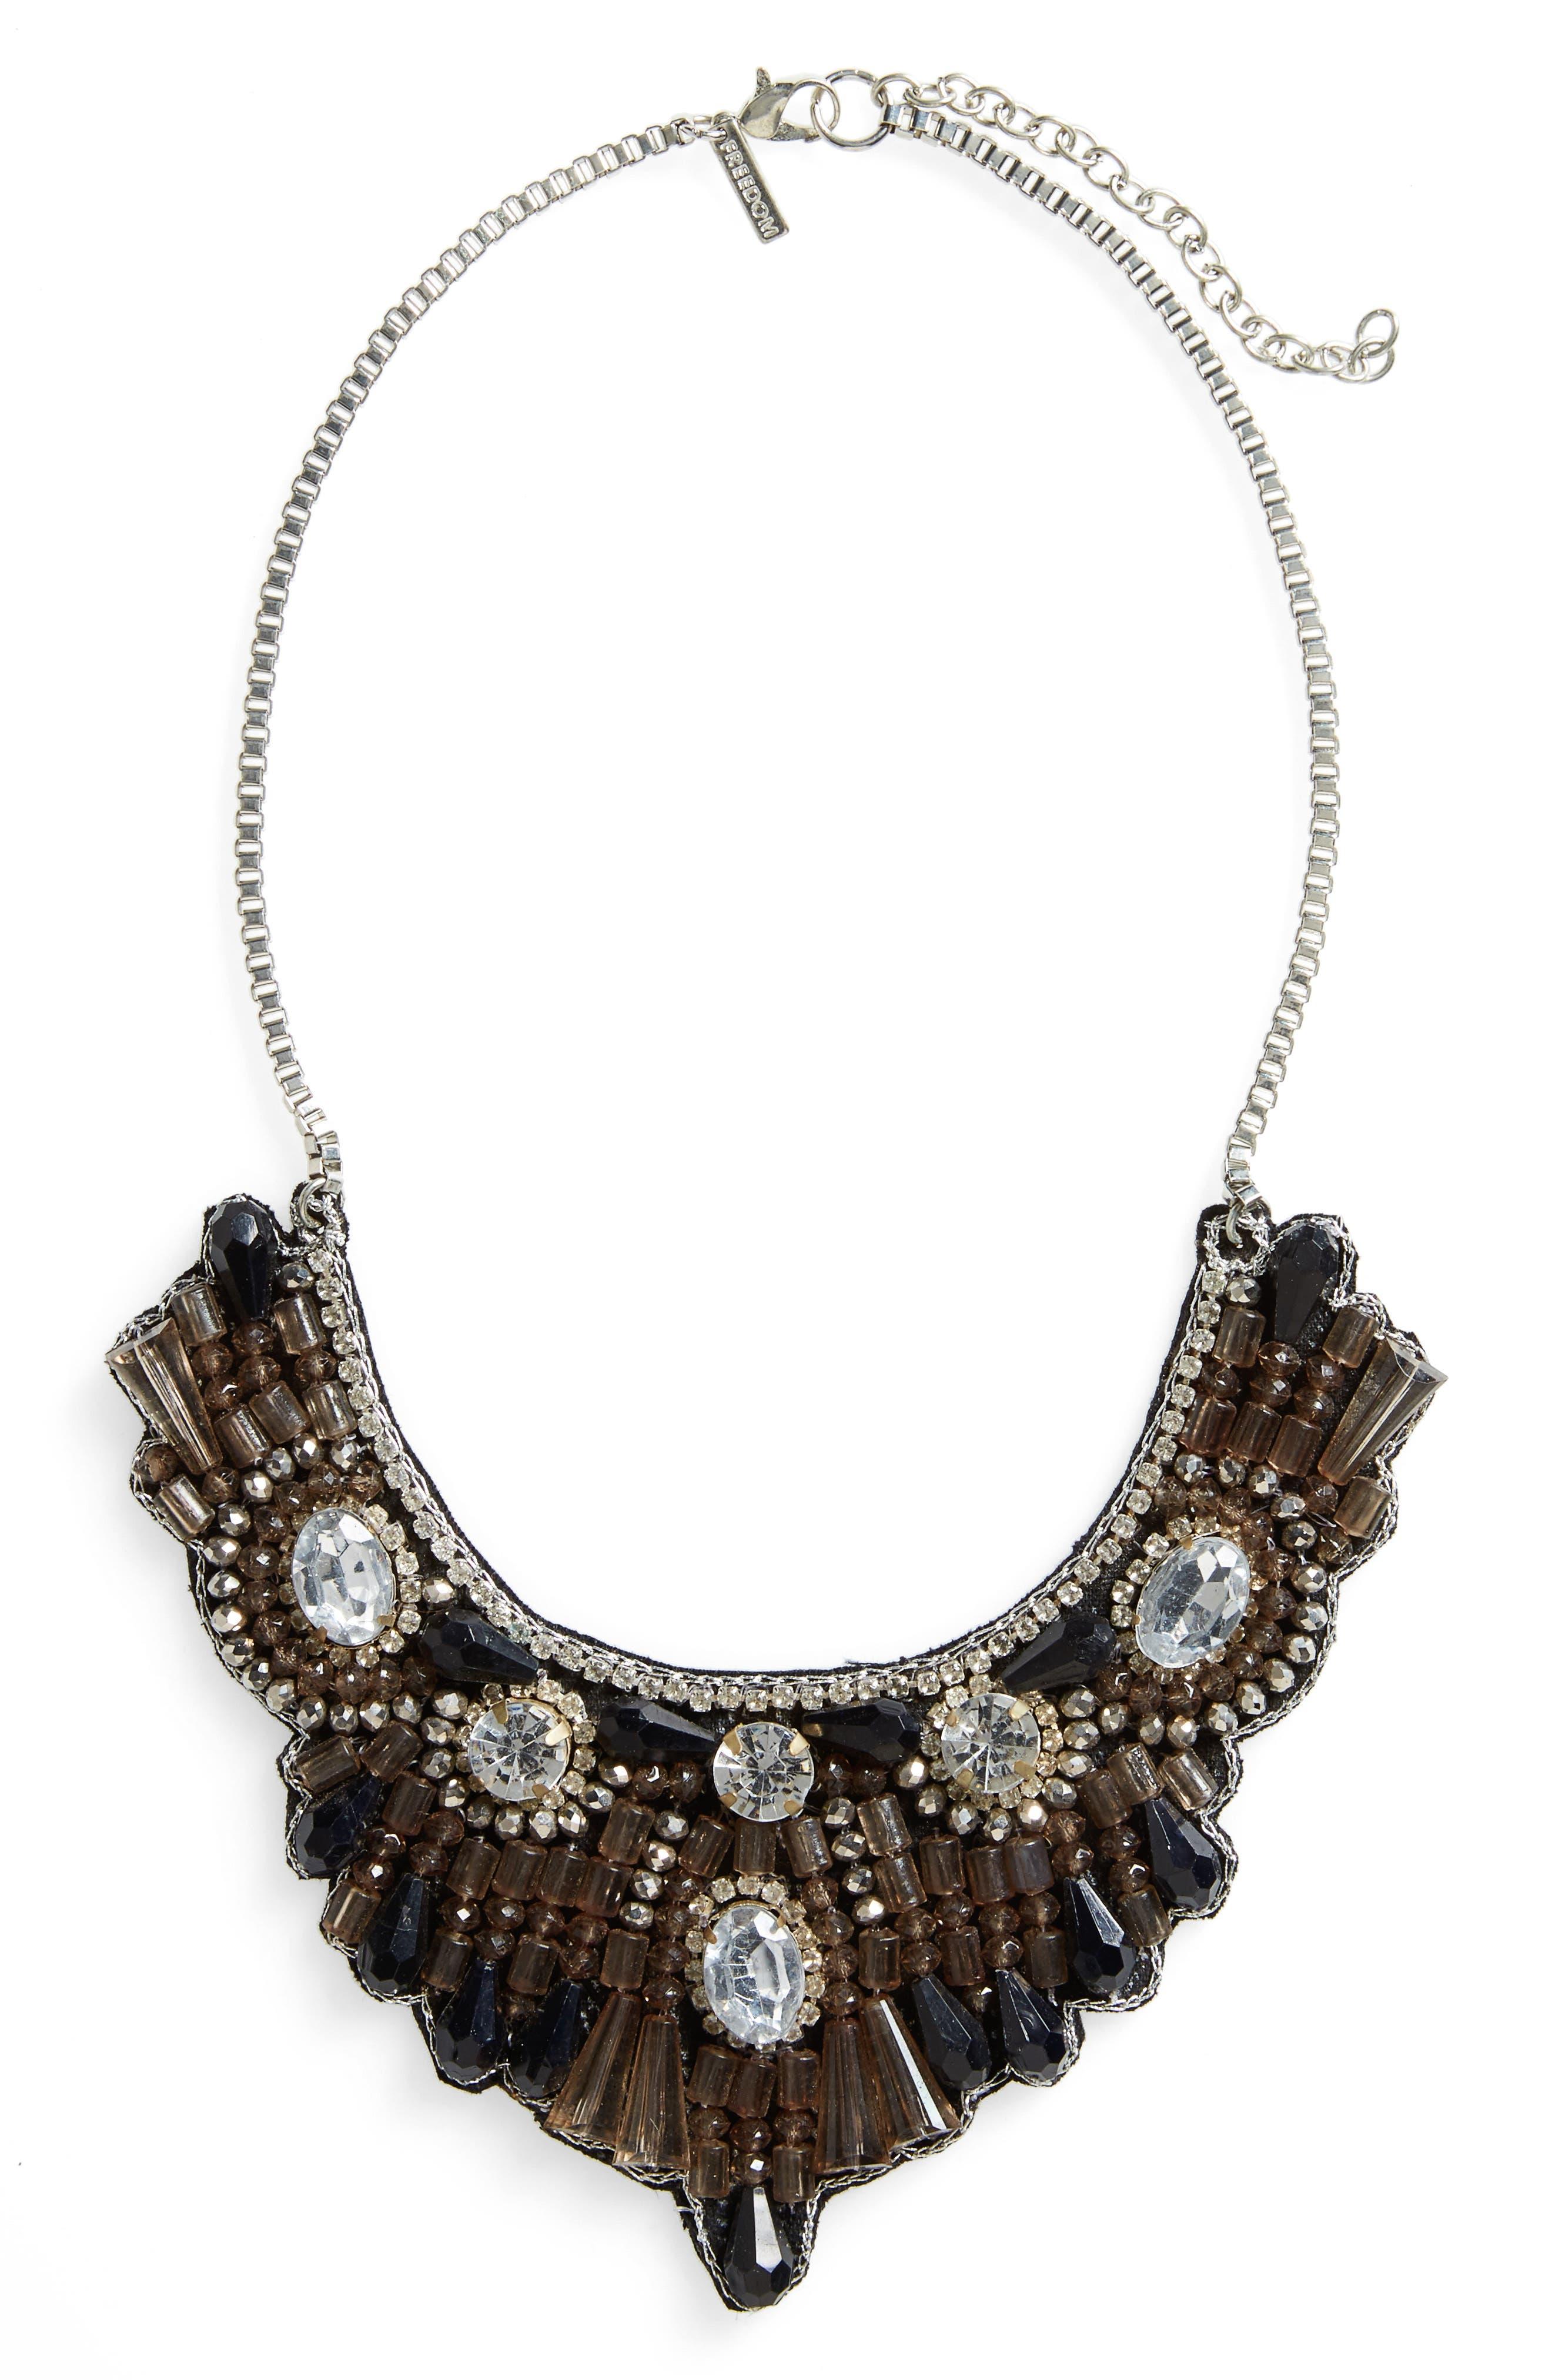 Alternate Image 1 Selected - Topshop Crystal & Bead Bib Necklace